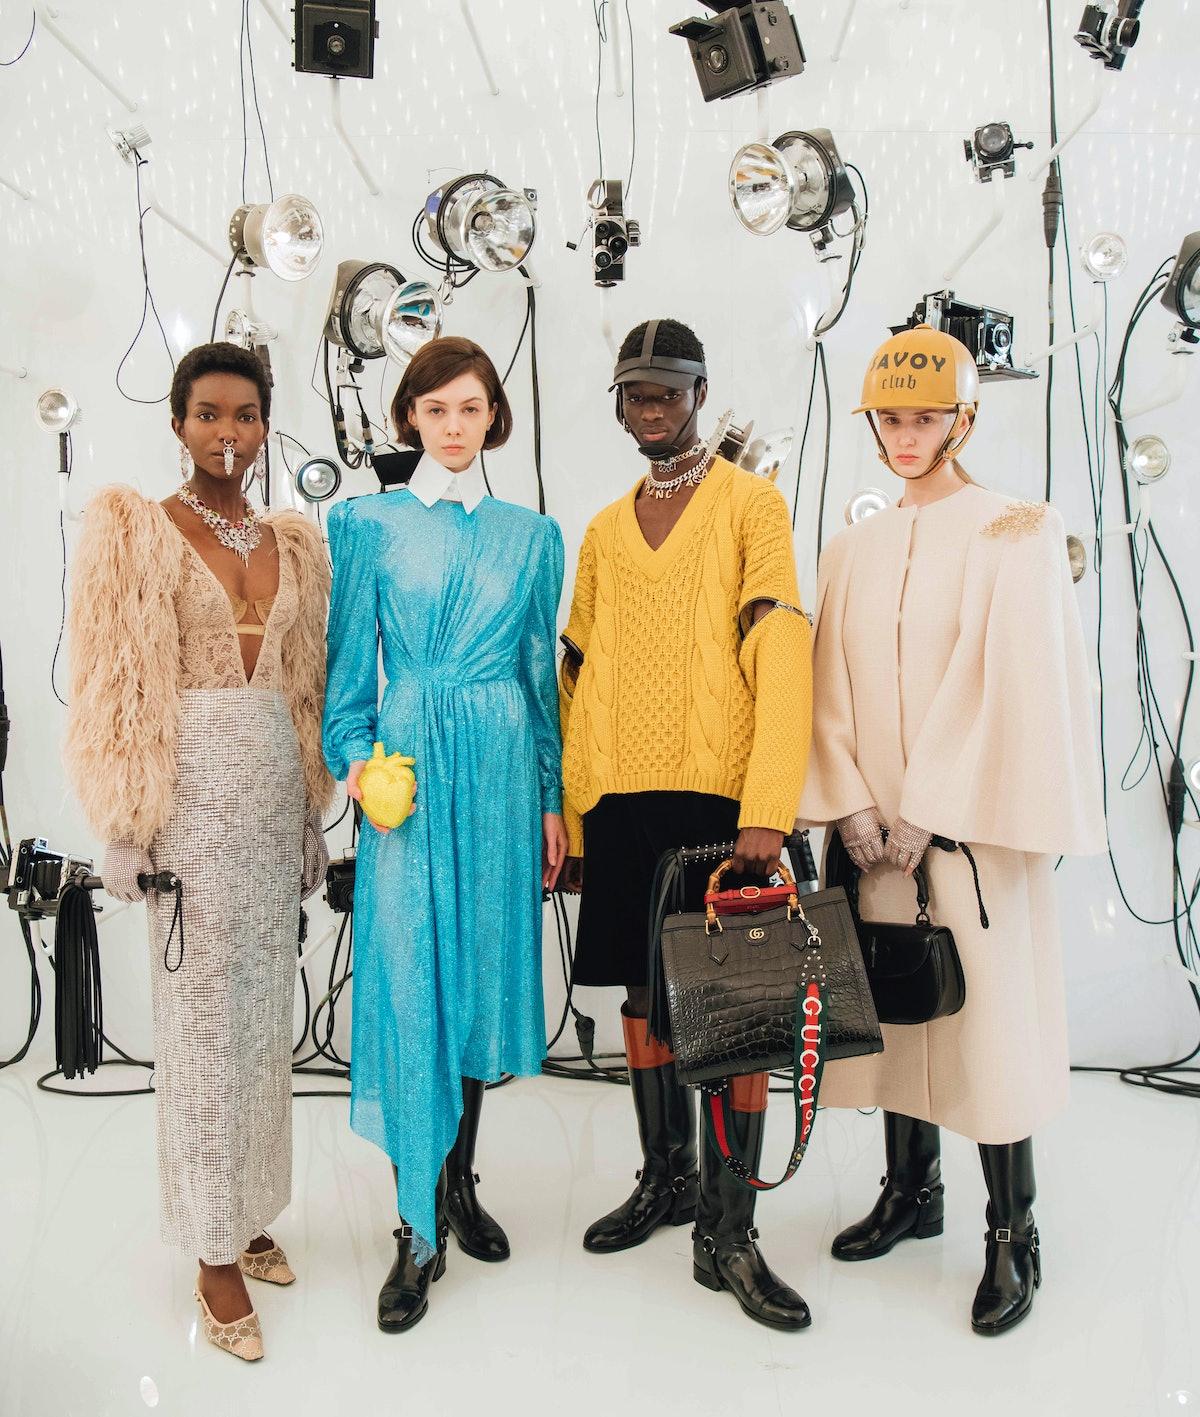 Four Gucci models